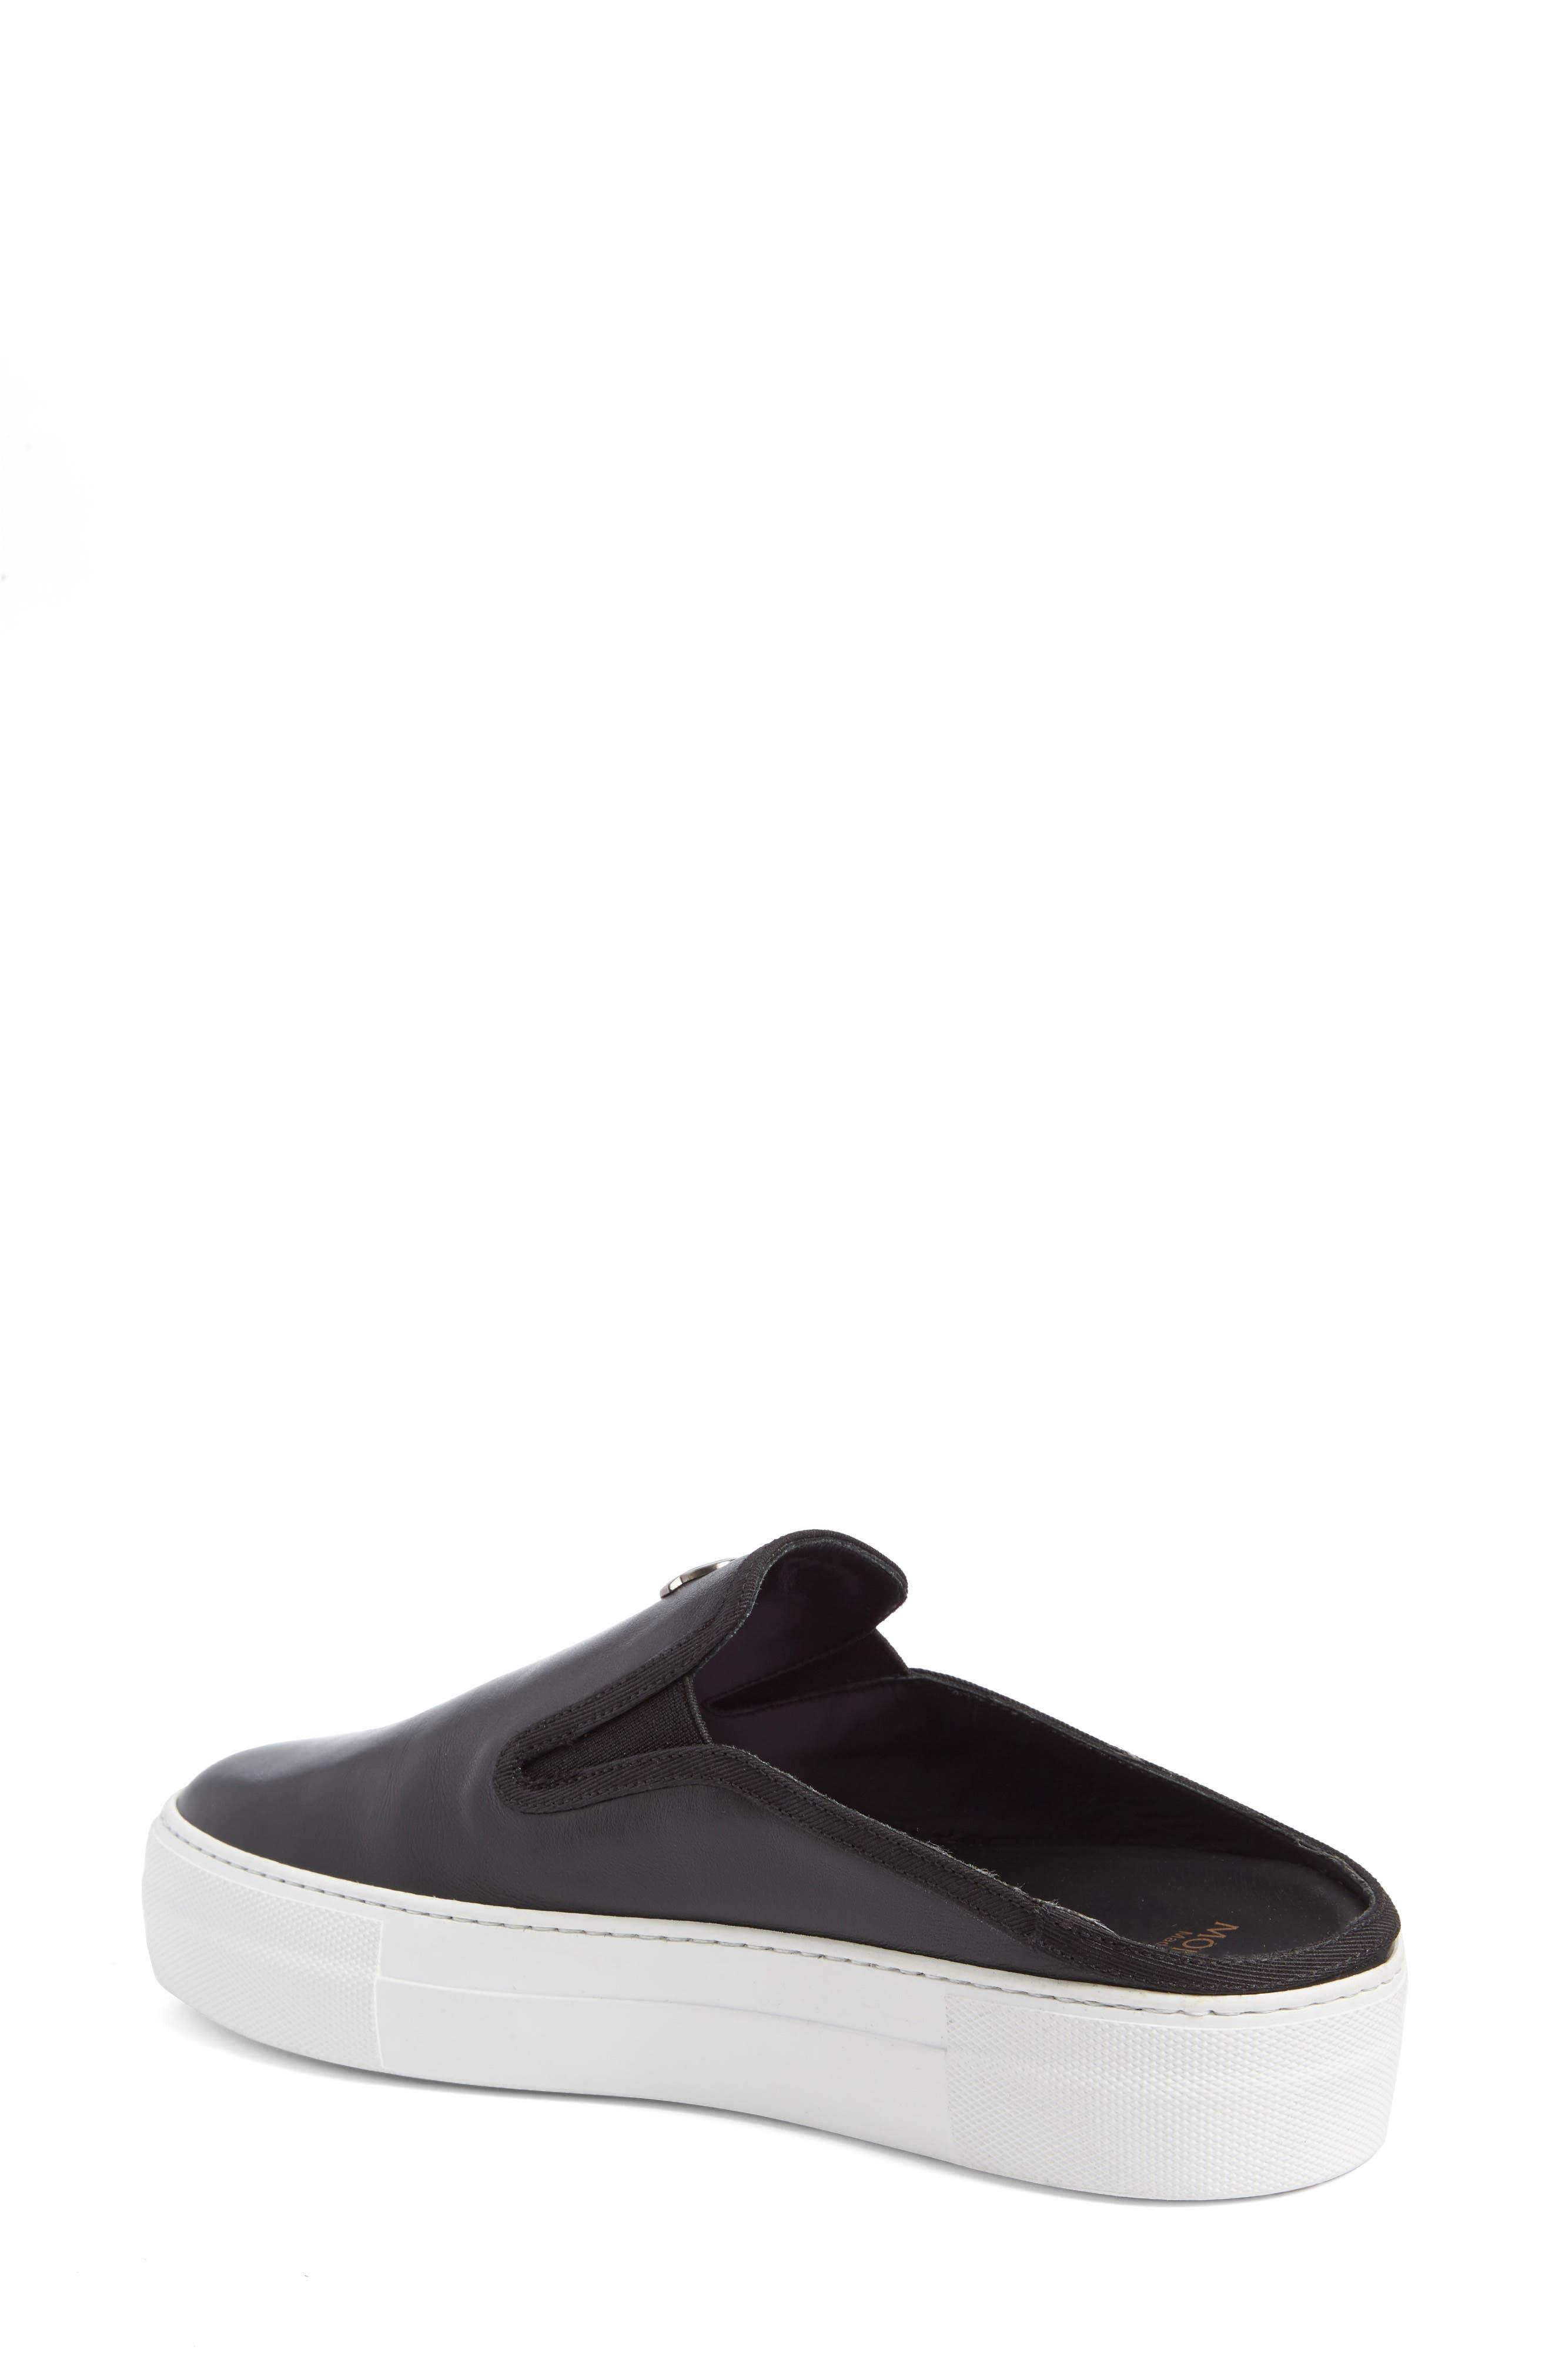 Tiphanie Backless Platform Sneaker,                             Alternate thumbnail 2, color,                             Black Leather